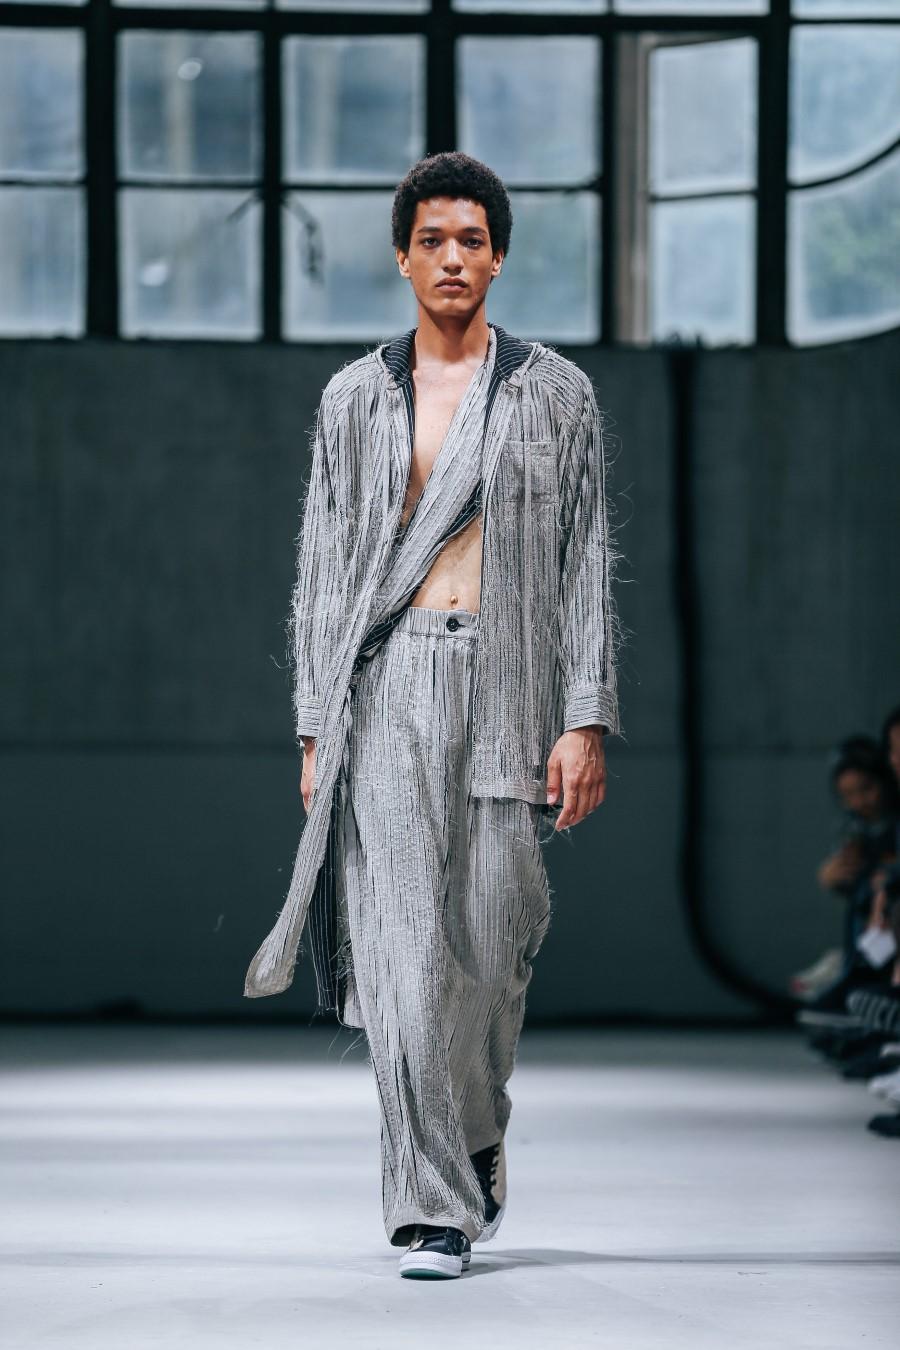 DANSHAN - Printemps-Été 2020 - Shanghai Fashion Week